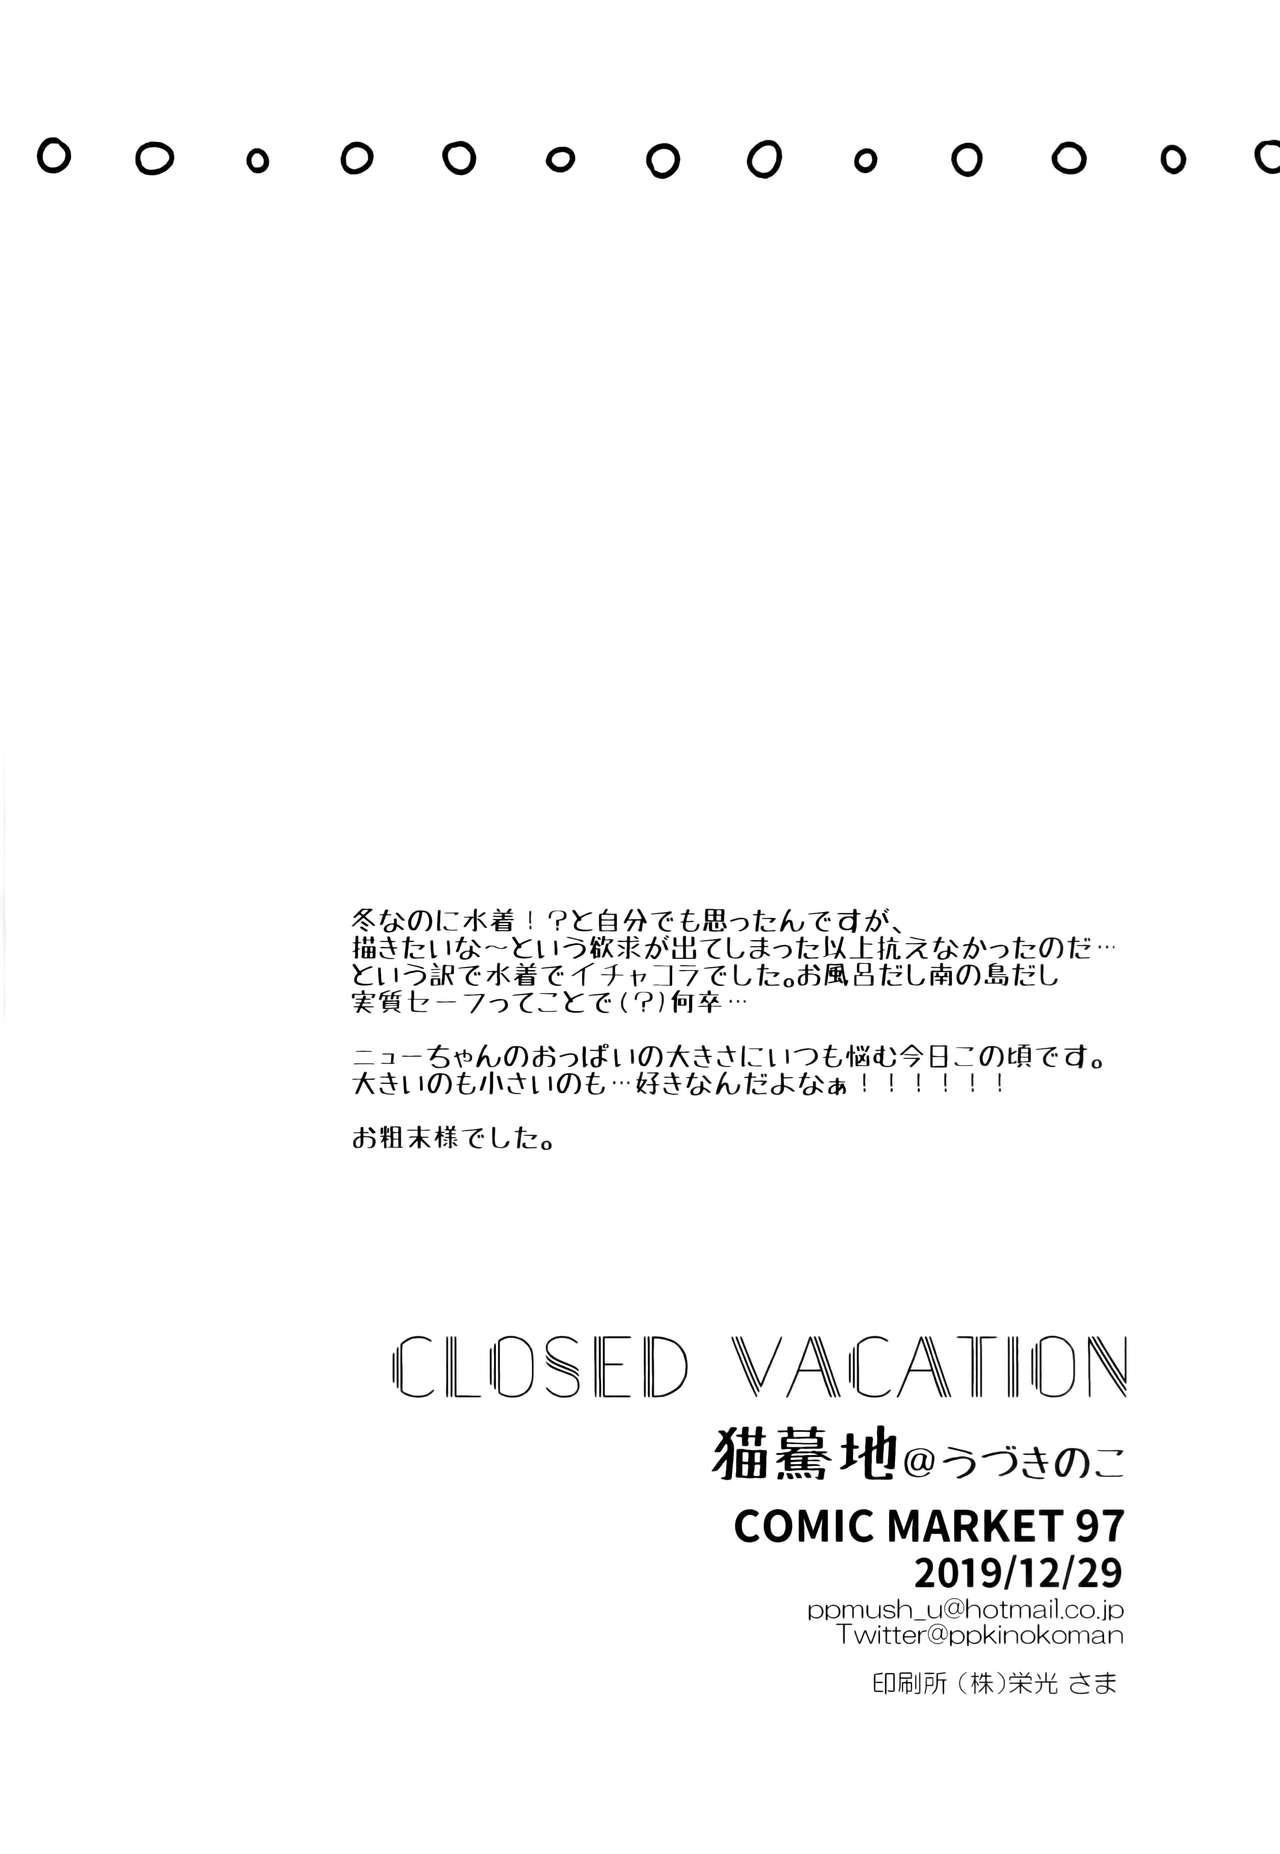 CLOSED VACATION 27